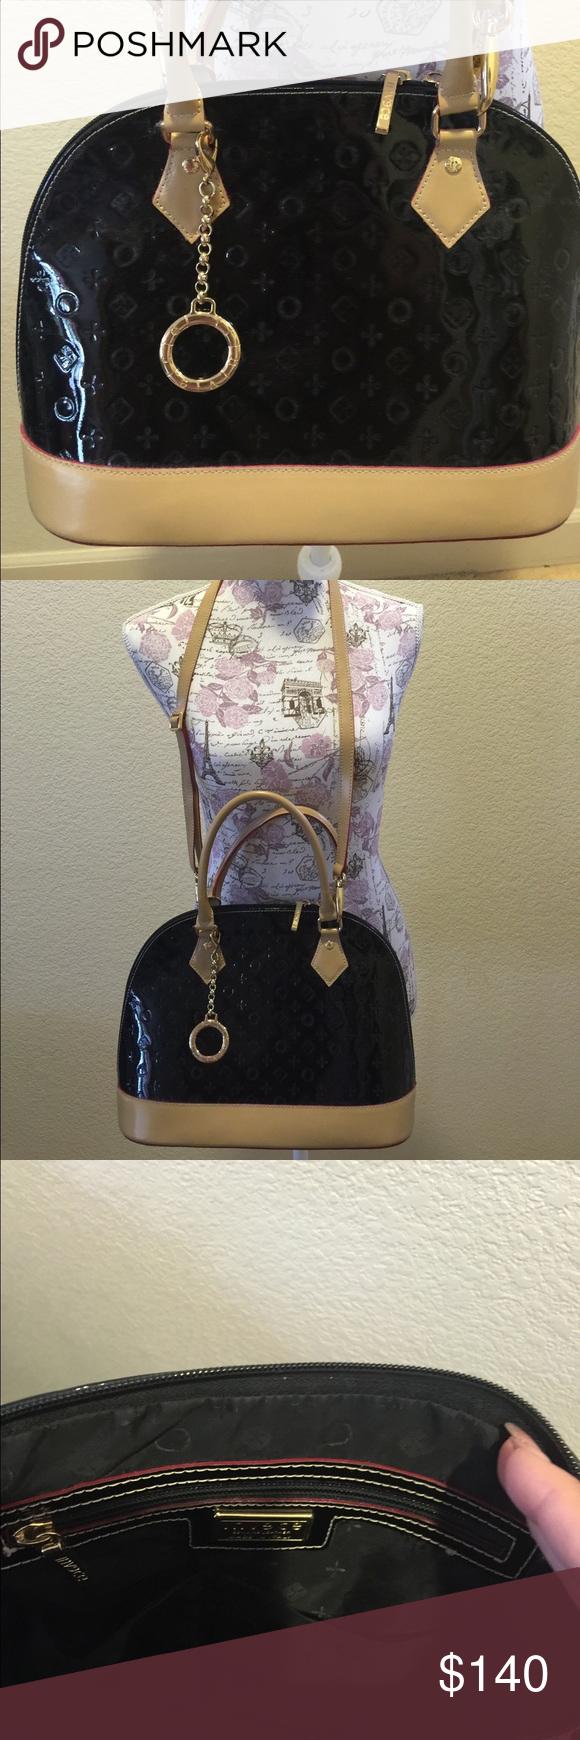 Invece Black Leather Handbag Satchel Crossbody Italian Purse Great